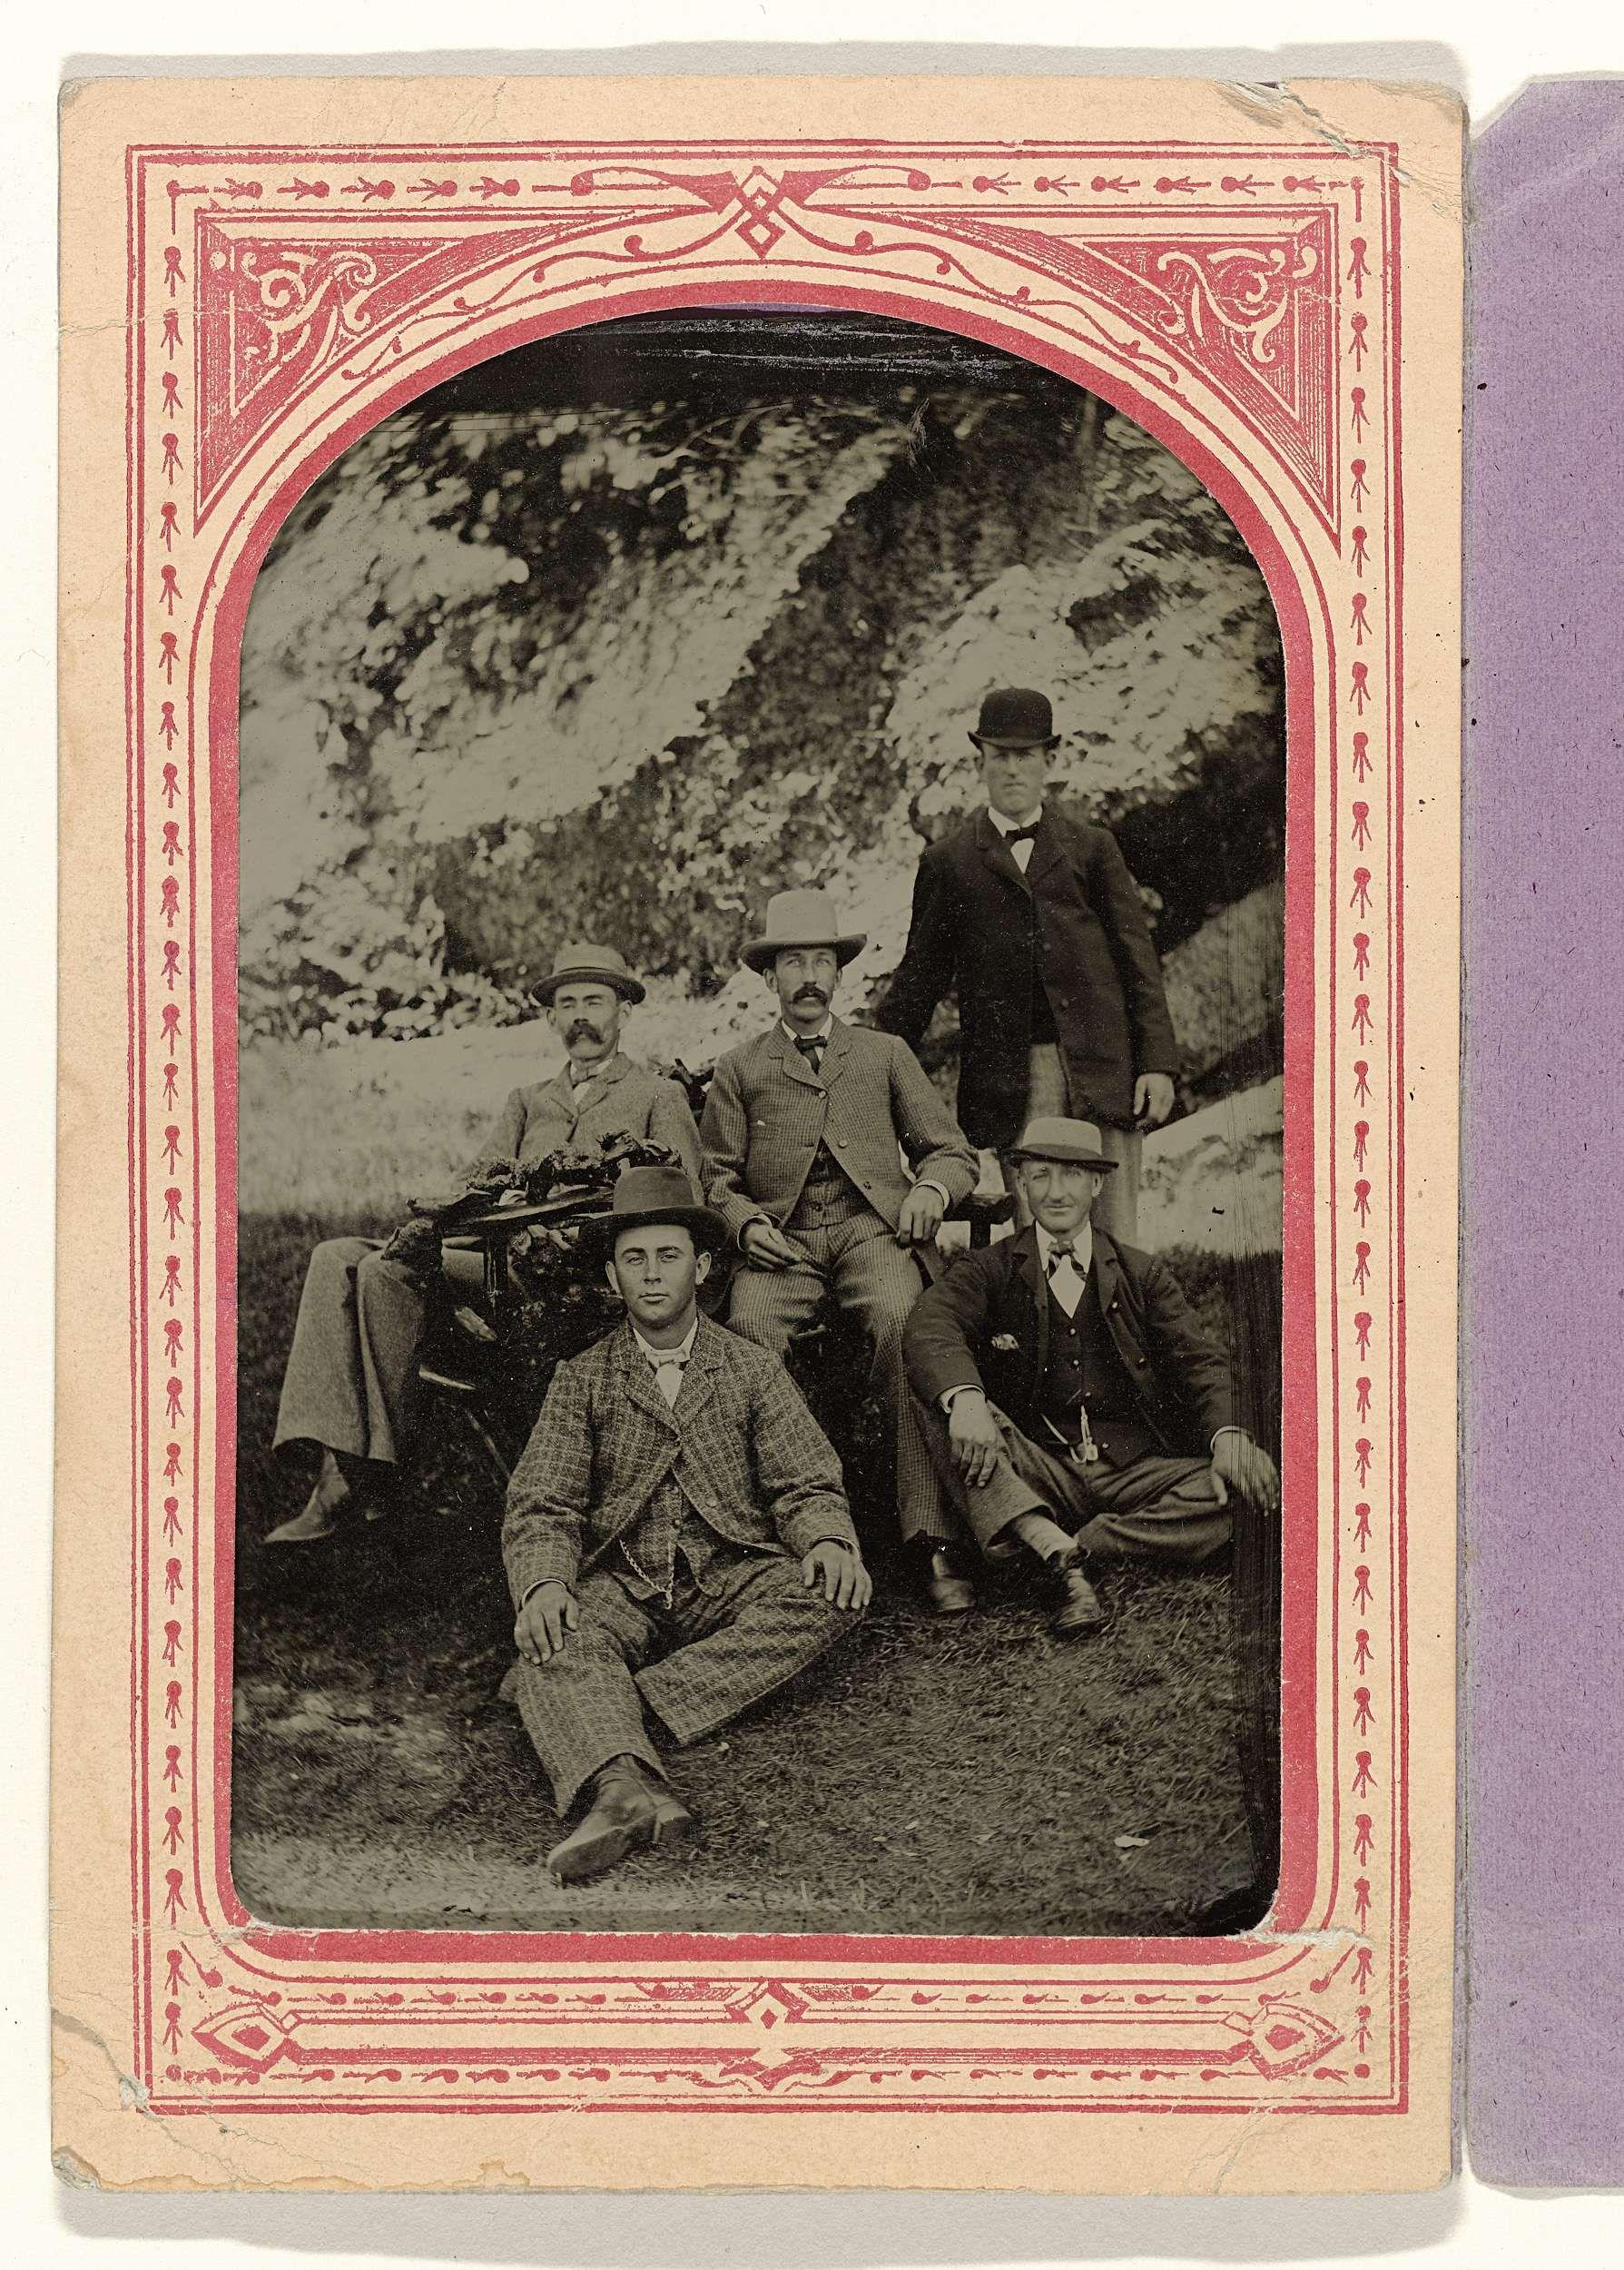 Groepsportret van vijf mannen, Rocky Point (Amusement Park), John Hiram Aylsworth, c. 1900 - c. 1910